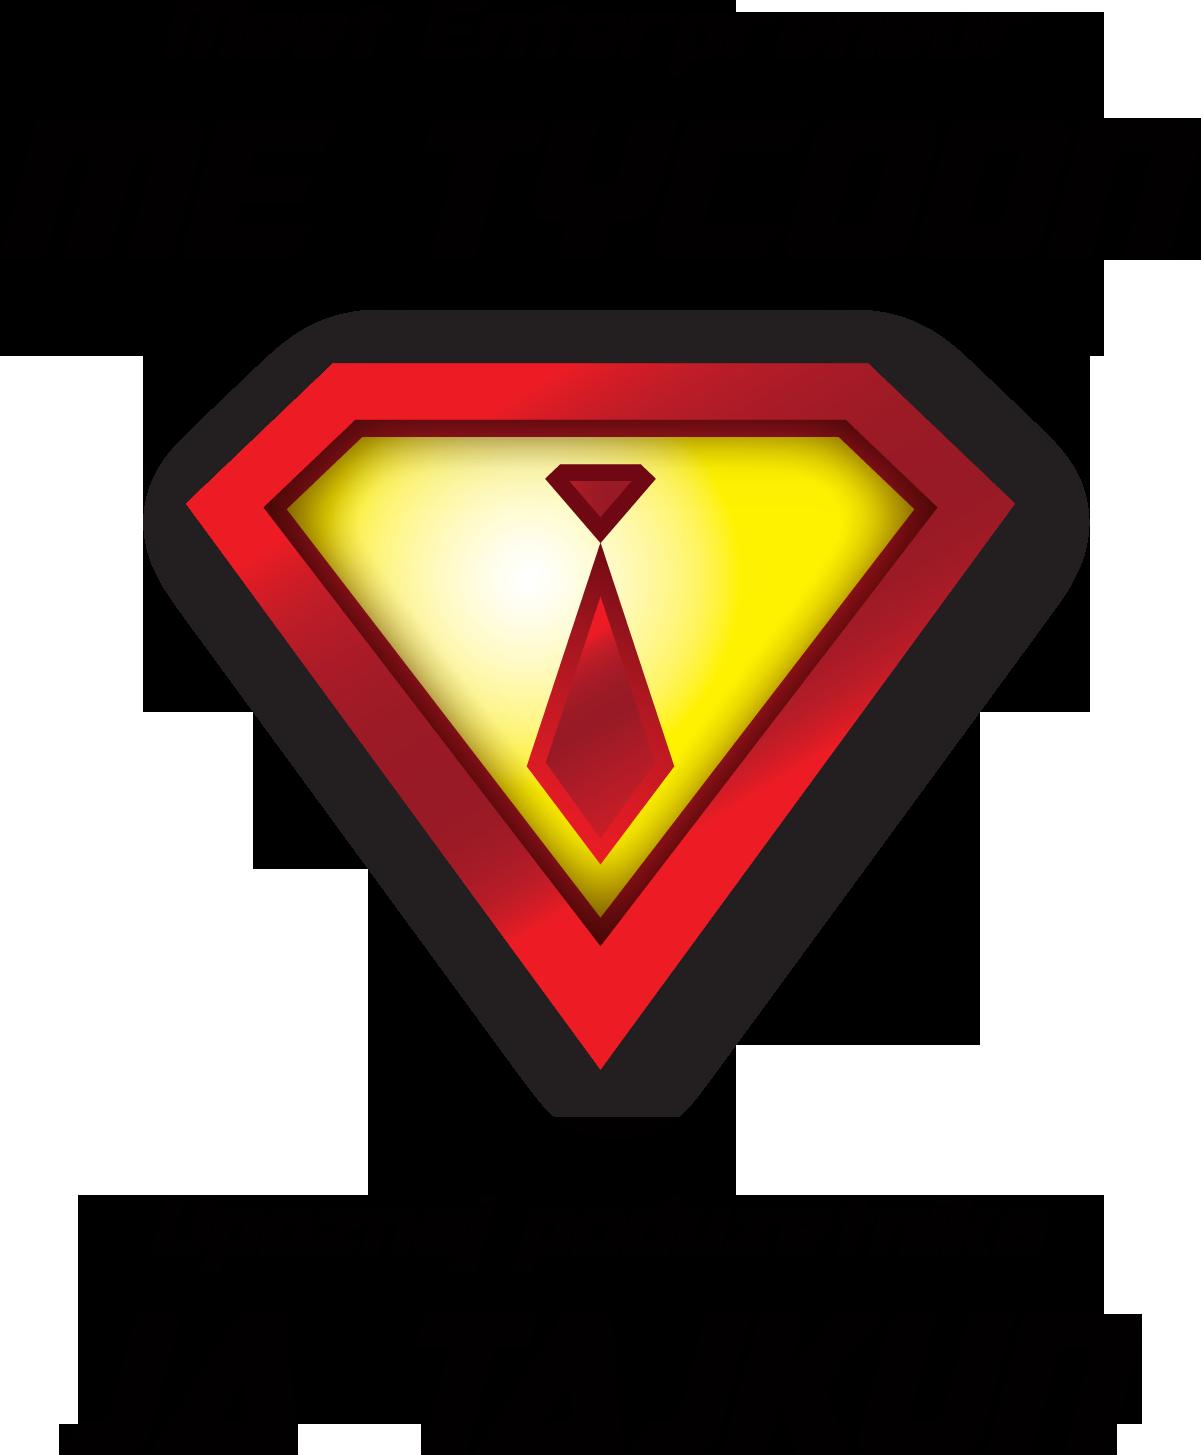 391_ja_tajkun_logo_fin